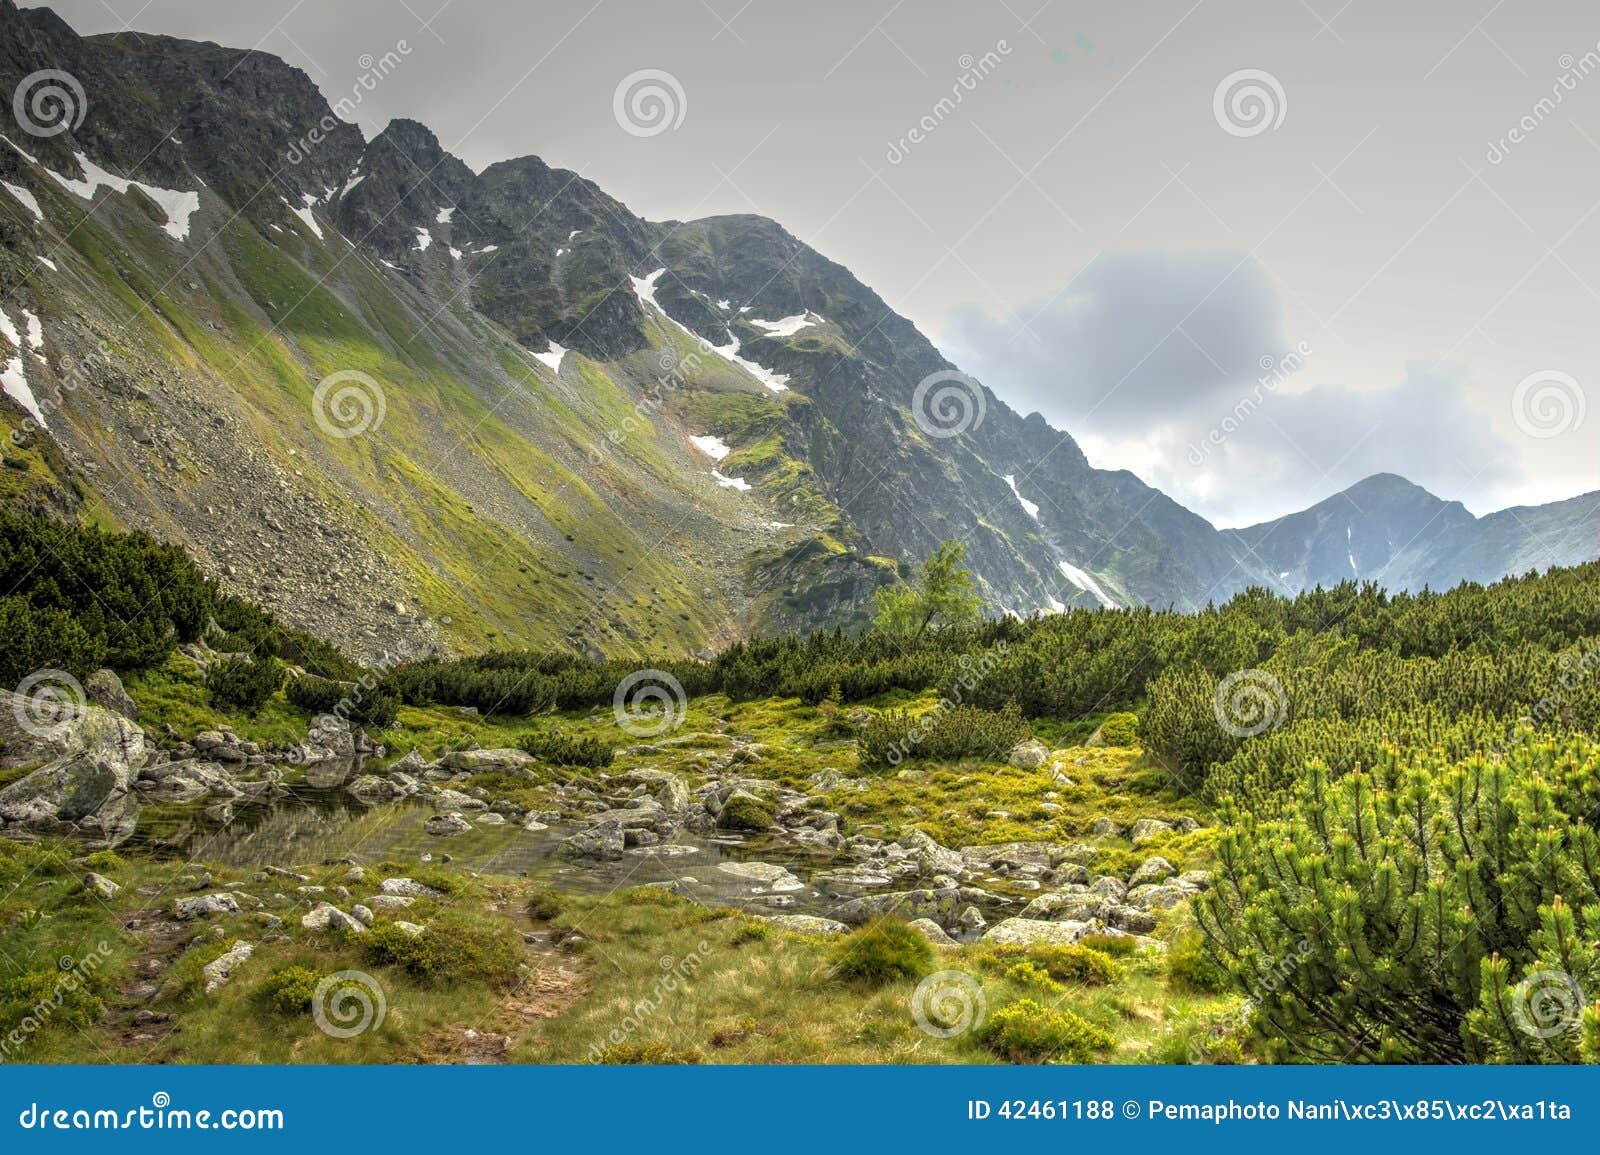 Große rauchige Berge Nationalpark, Tennessee, USA